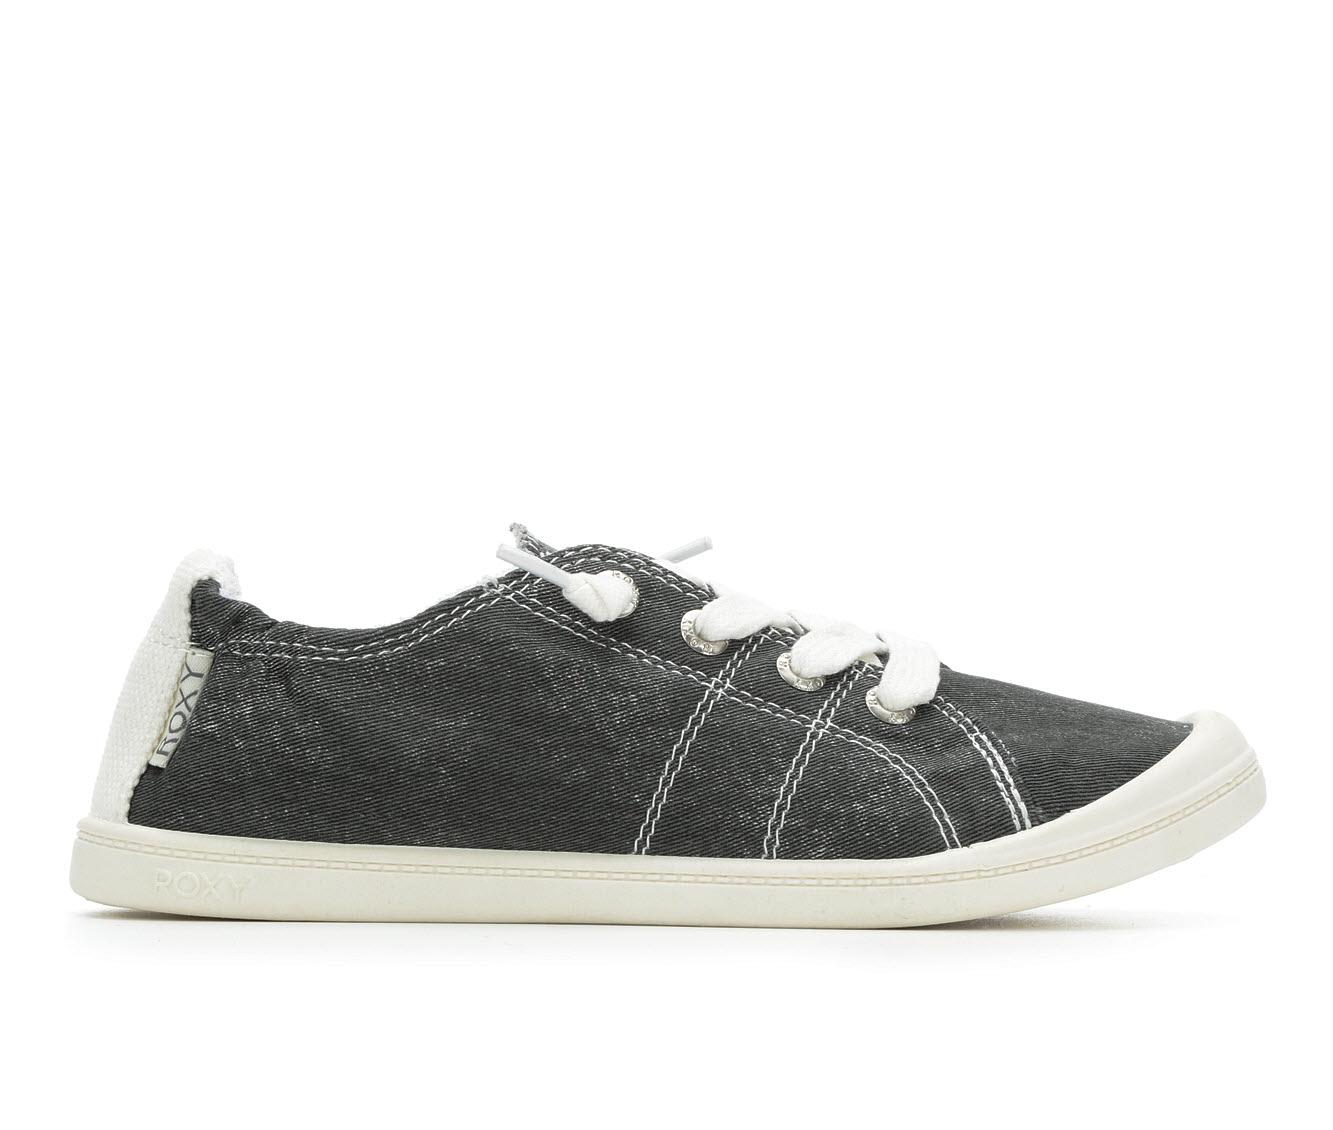 Roxy Bayshore Women's Shoe (Black Canvas)